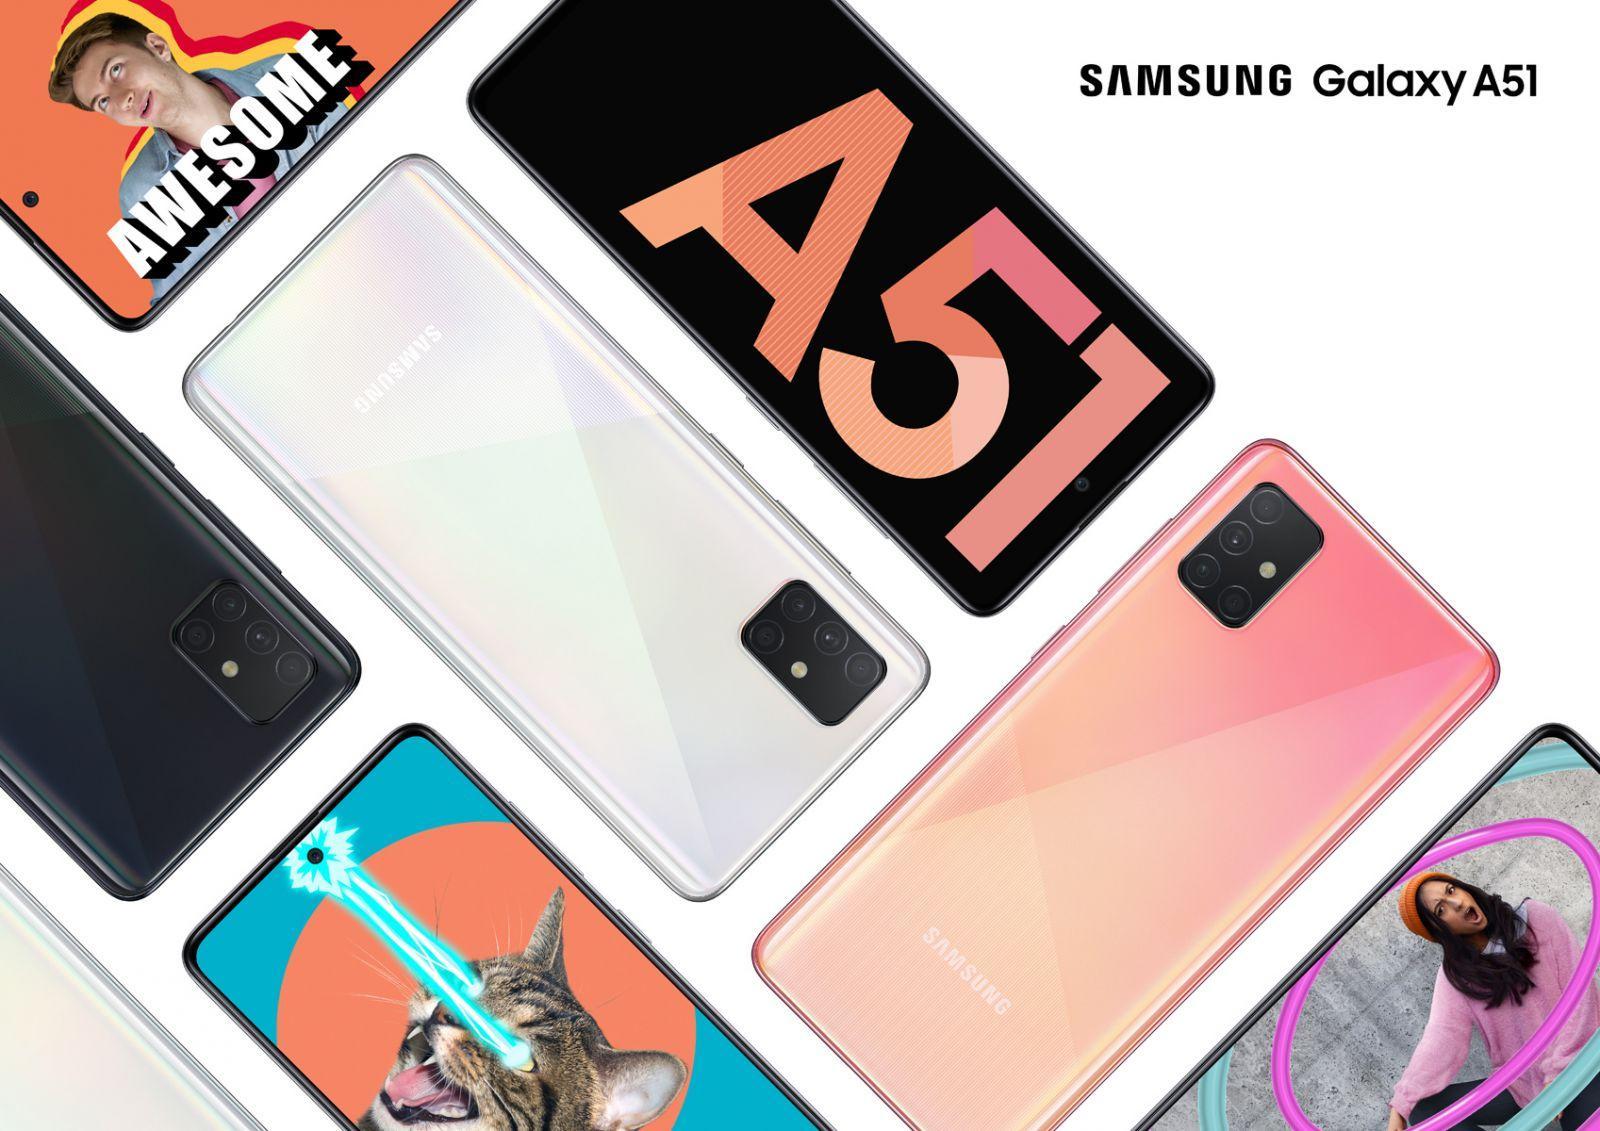 Samsung Galaxy A51 стал самым популярным Android смартфоном в начале 2020 года (img 20191212 132559)